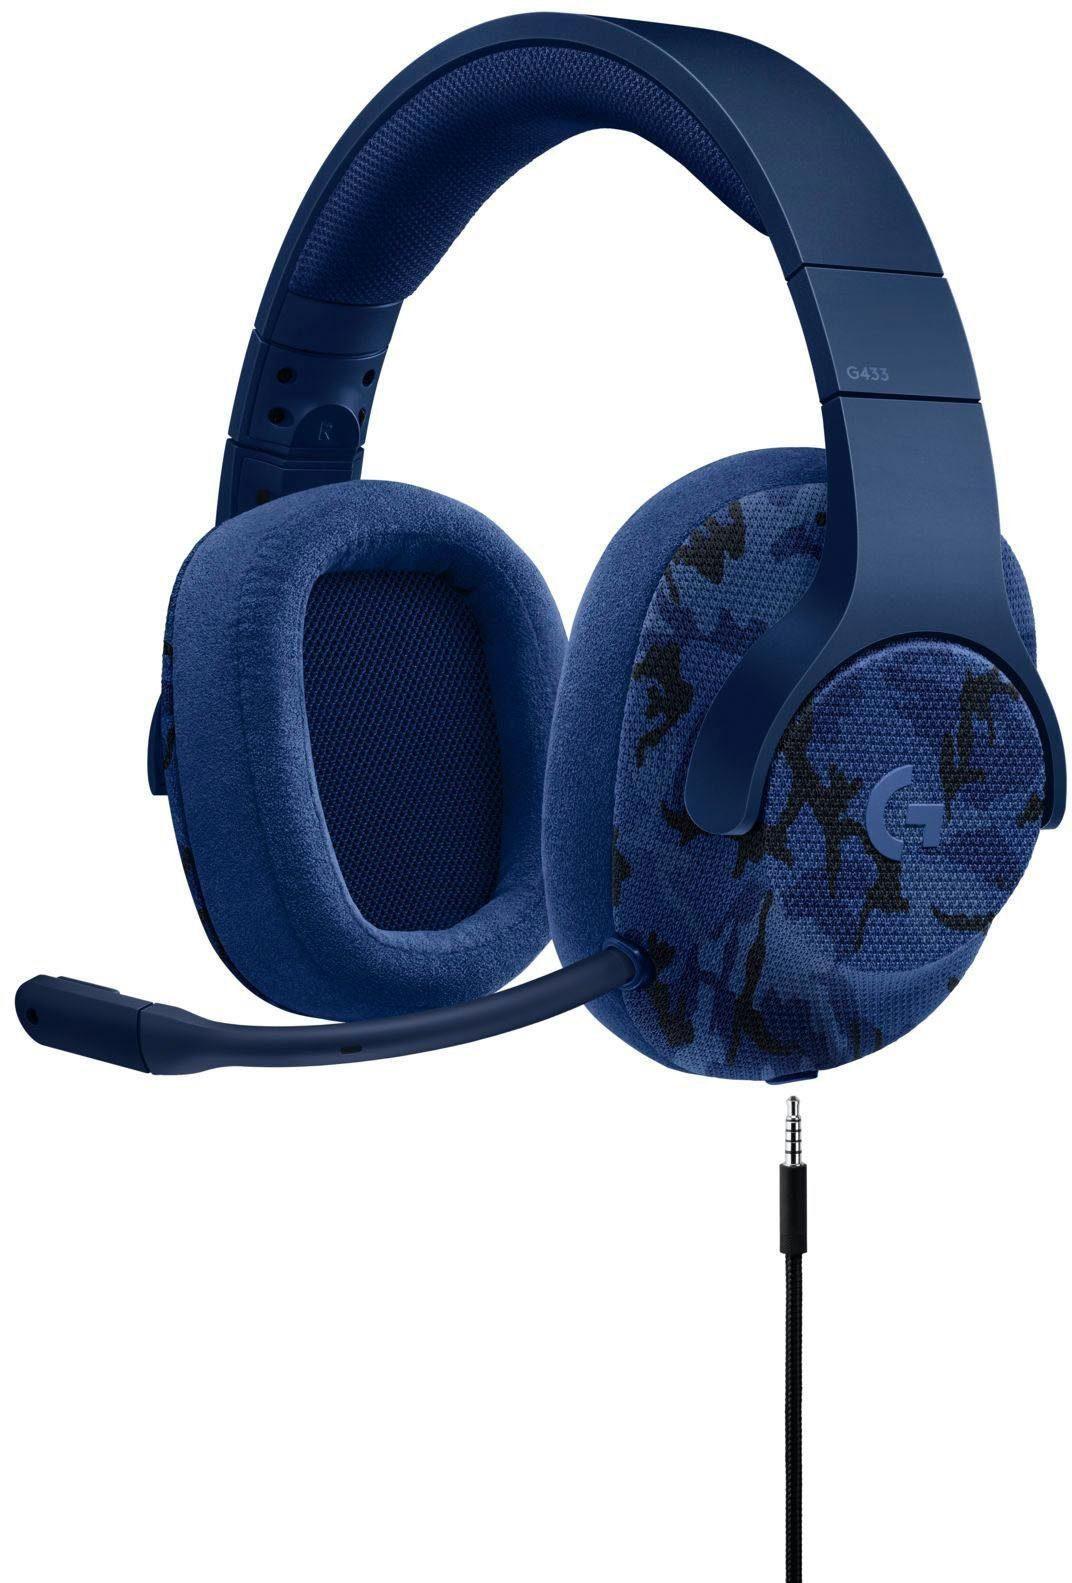 Logitech Games »G433« Gaming-Headset (Rauschunterdrückung)